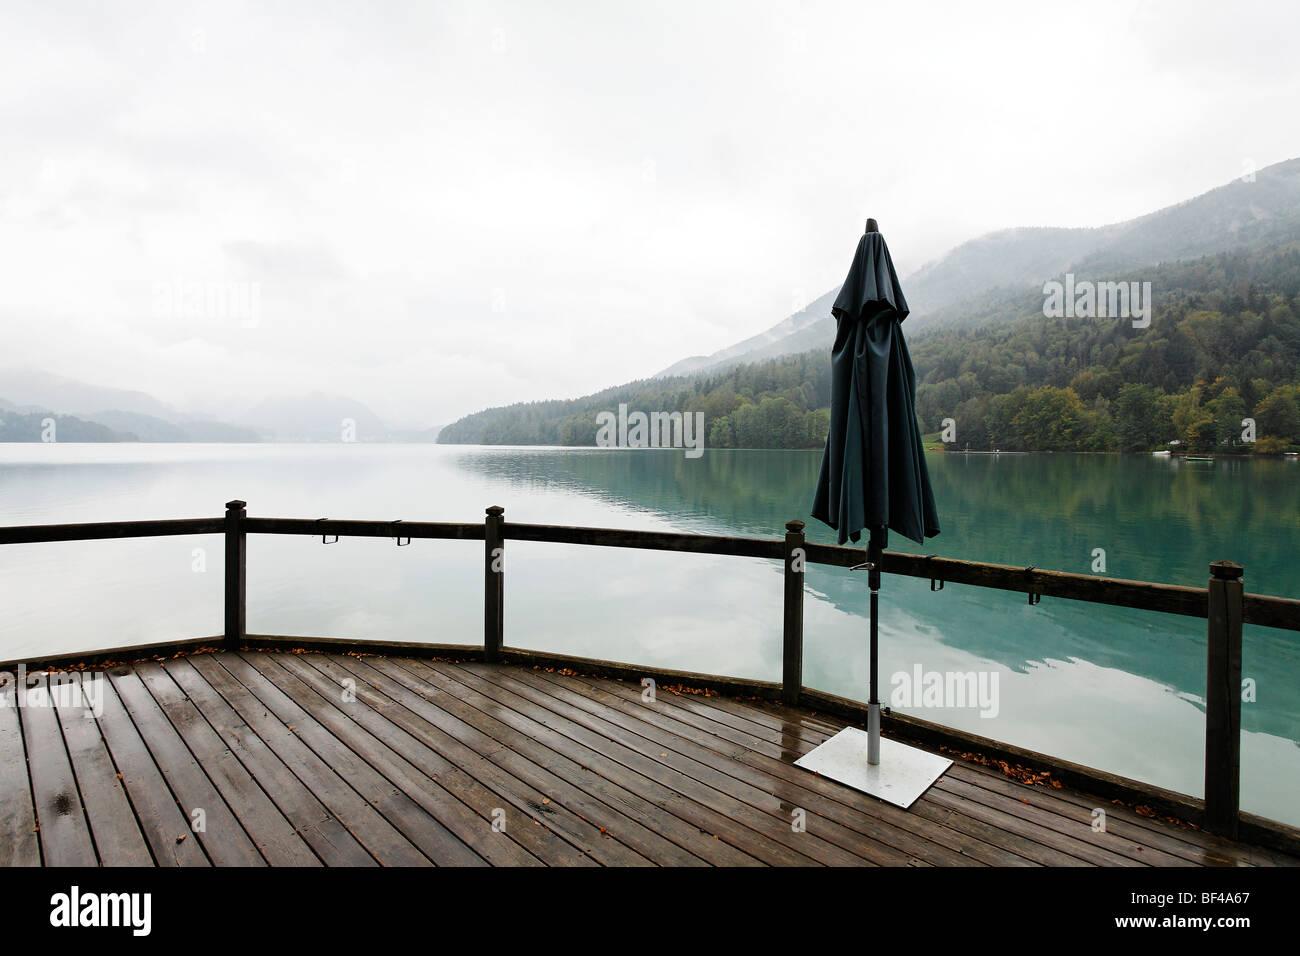 Single closed parasol, terrace on the lake, overcast sky, rainy, dreary atmosphere, Fuschlsee lake, Salzkammergut - Stock Image